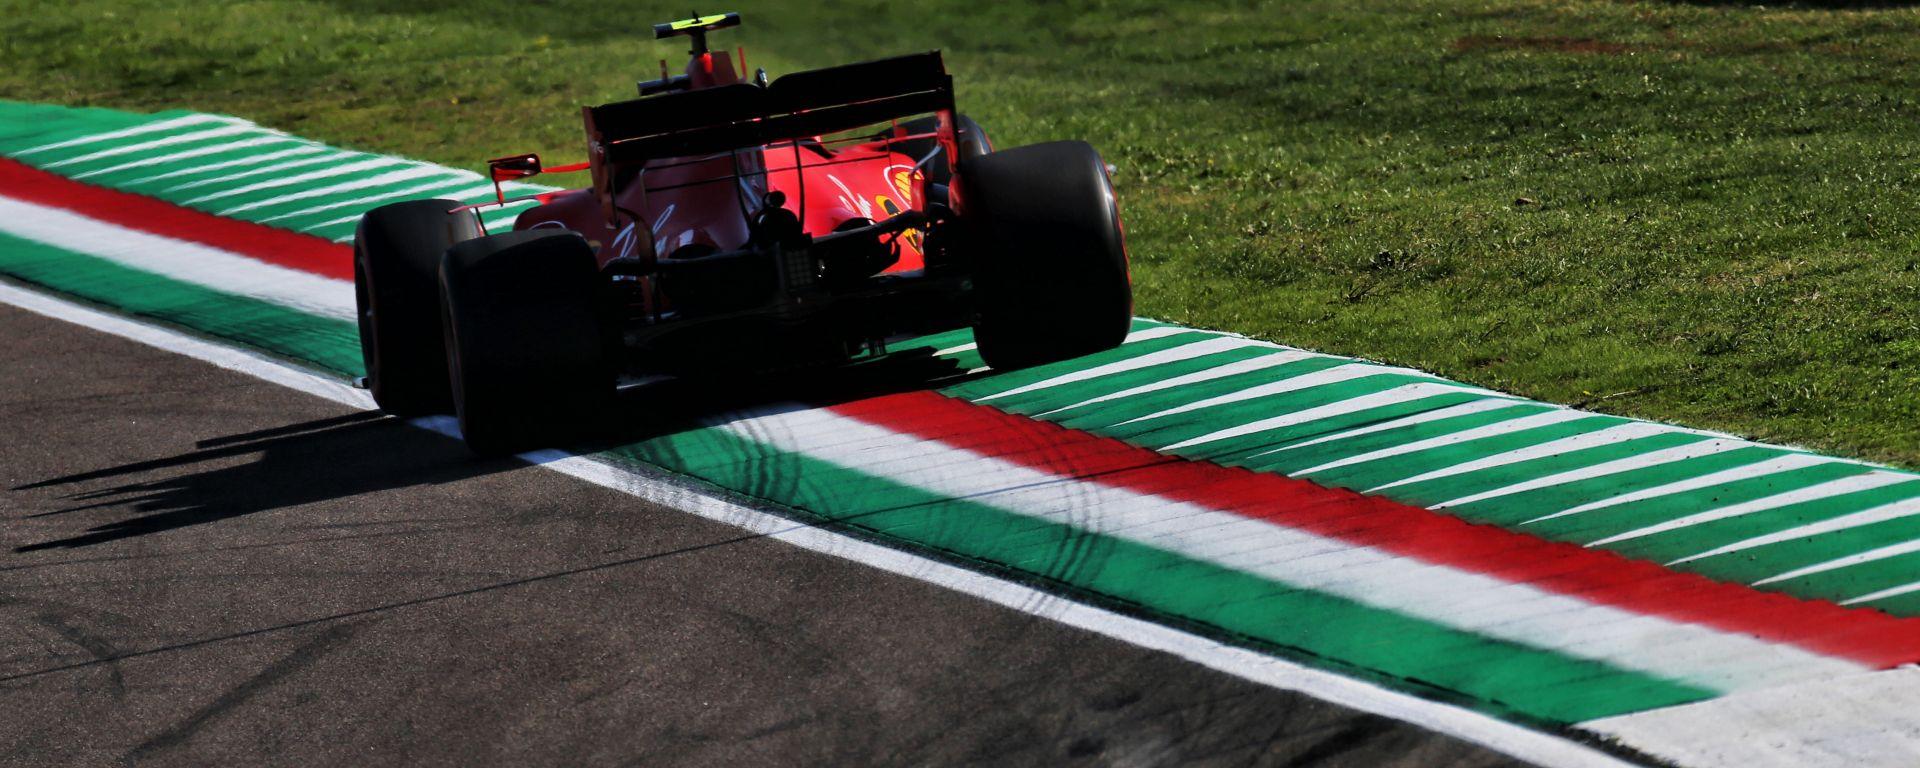 F1 GP Emilia Romagna 2020, Imola: Charles Leclerc (Scuderia Ferrari)